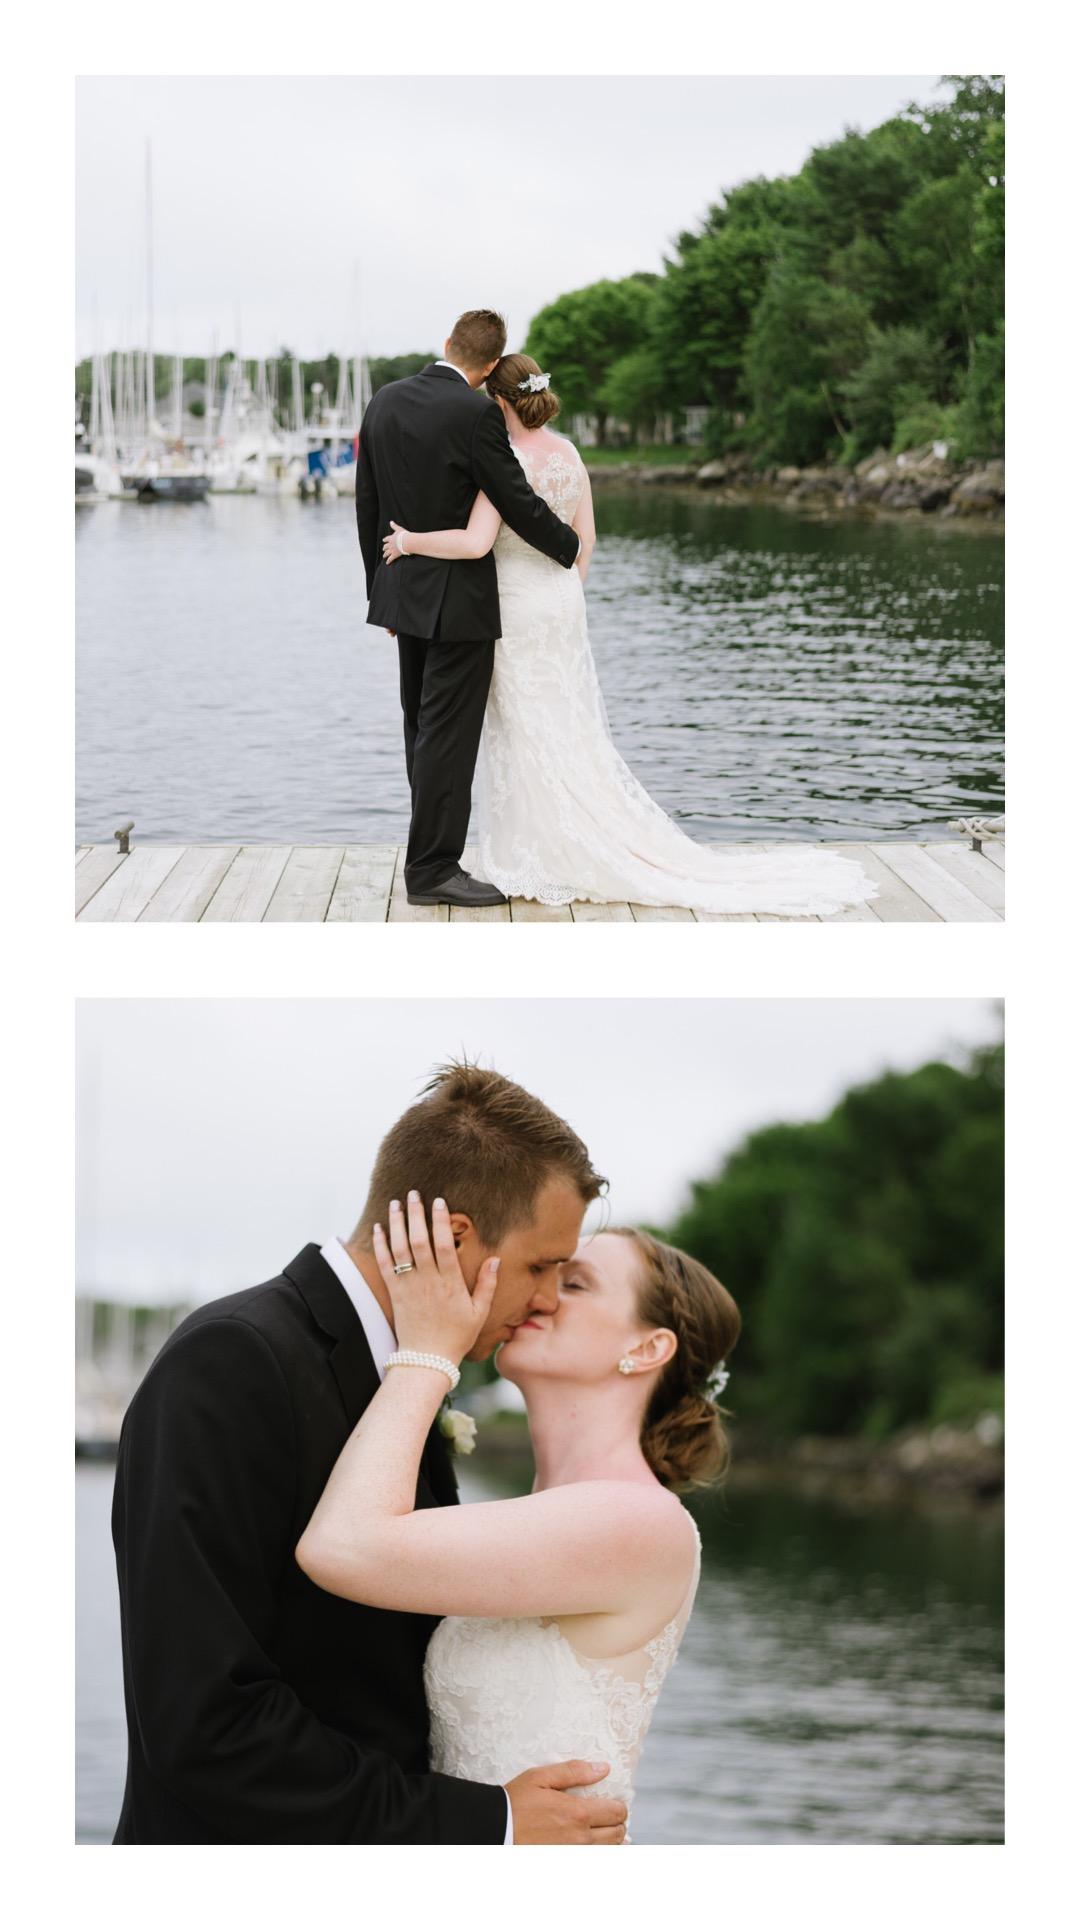 Martina & Scott Halifax Wedding Photographer - Sinead Dubeau Photography 19